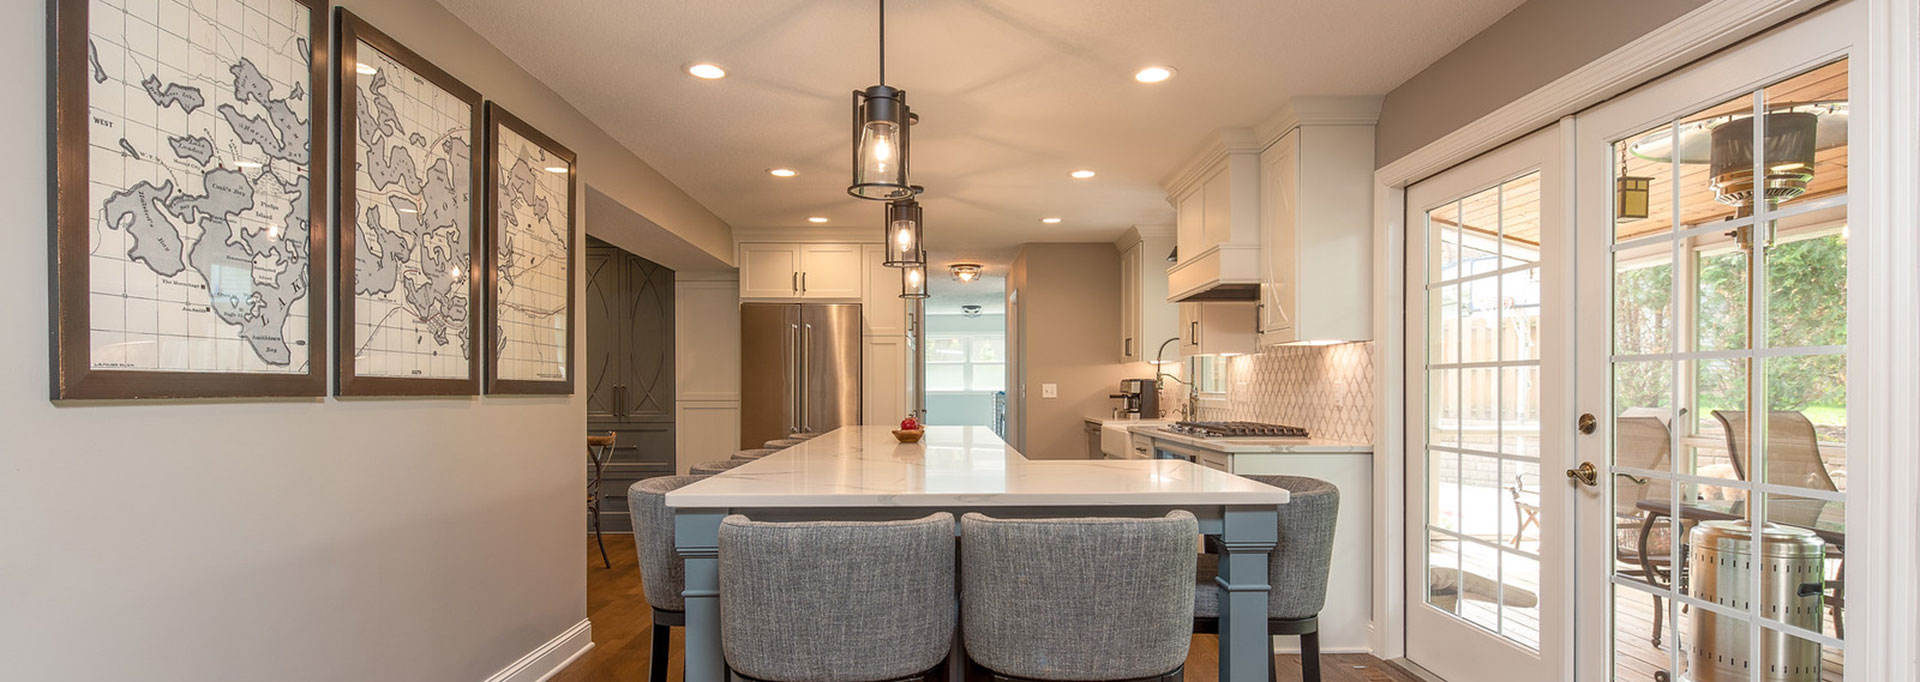 whole-house-remodeling-renovation.jpg